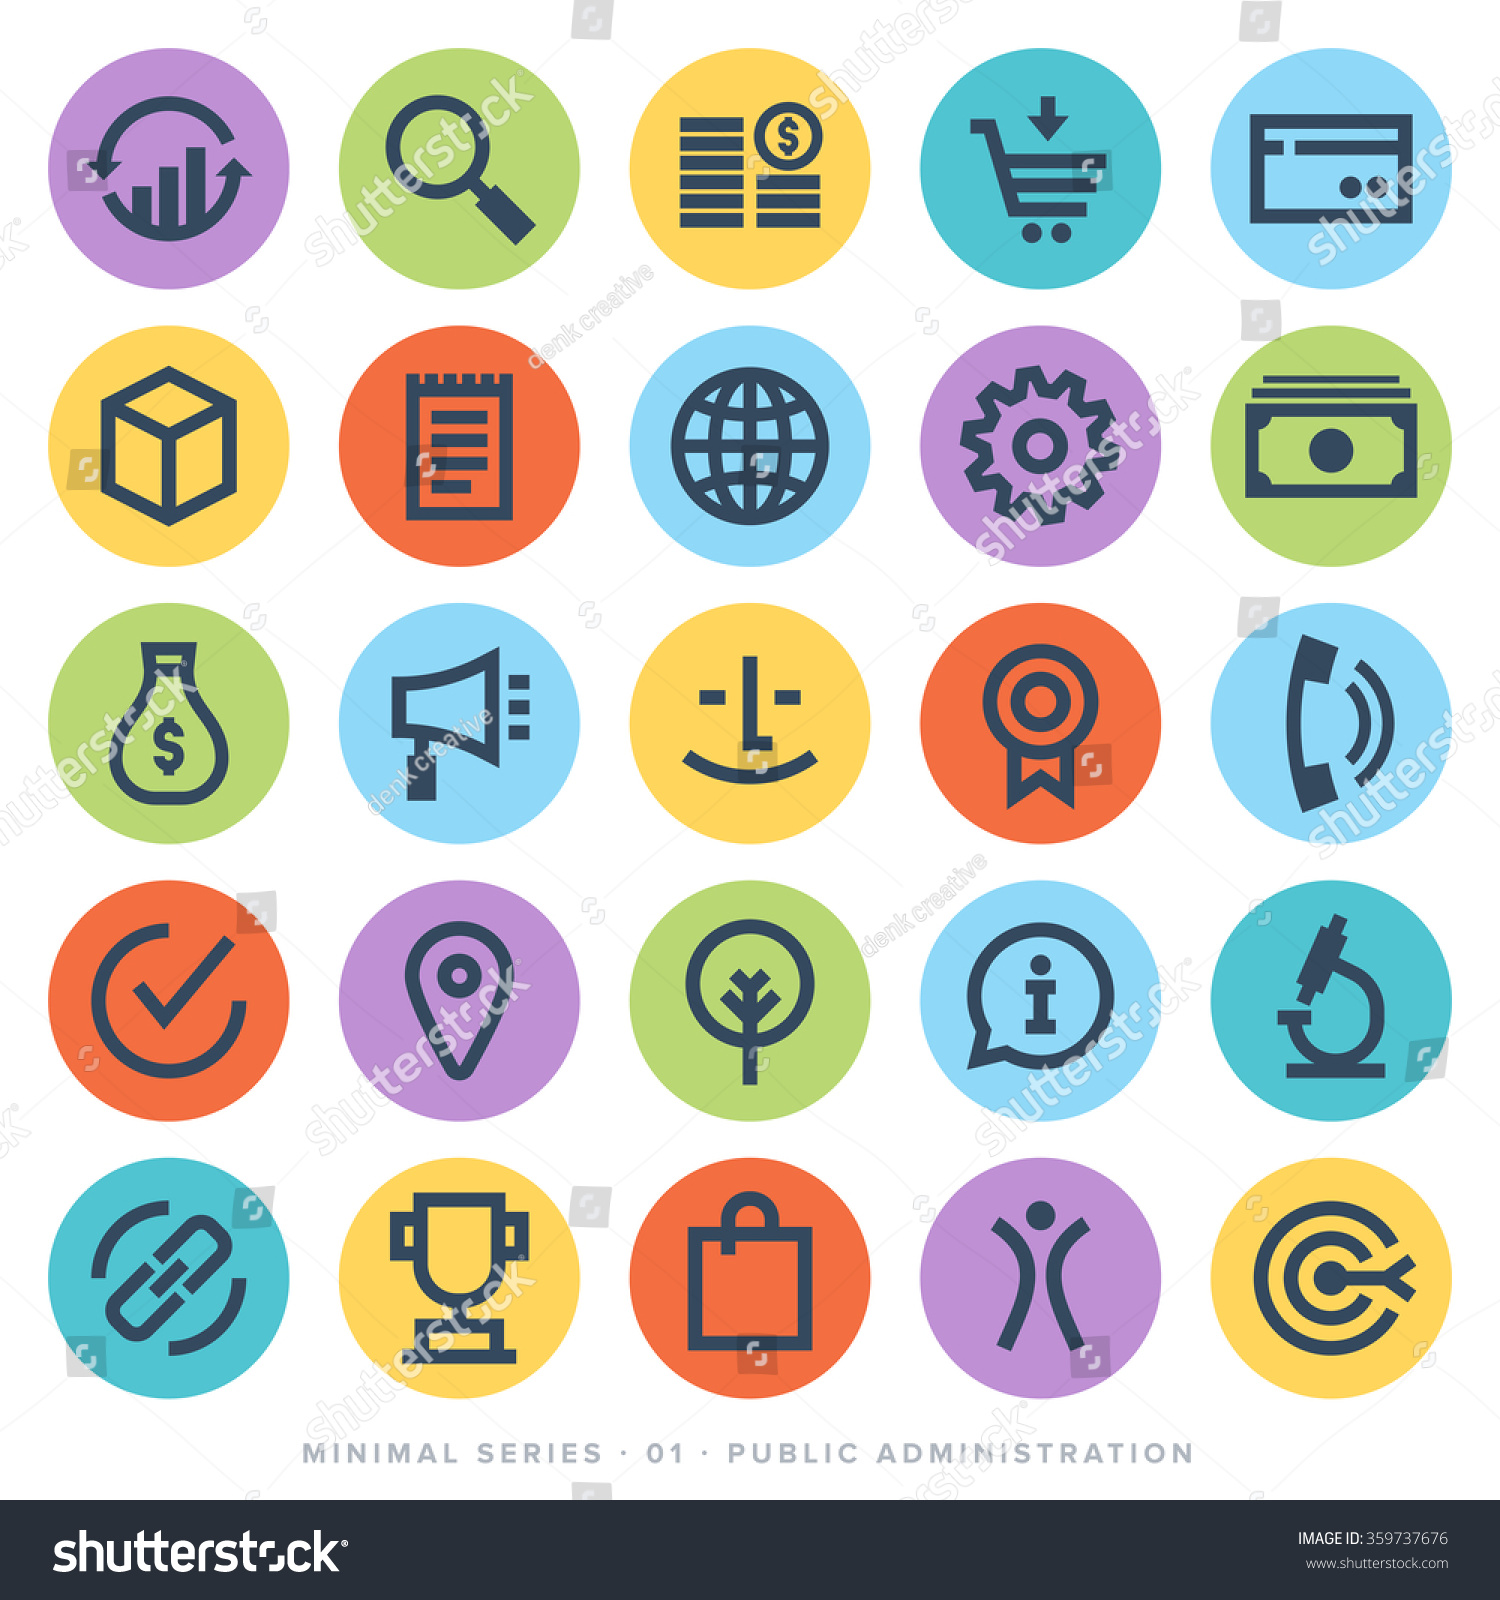 set of minimal modern black line icons business administration consumerism urban life concepts business life concepts